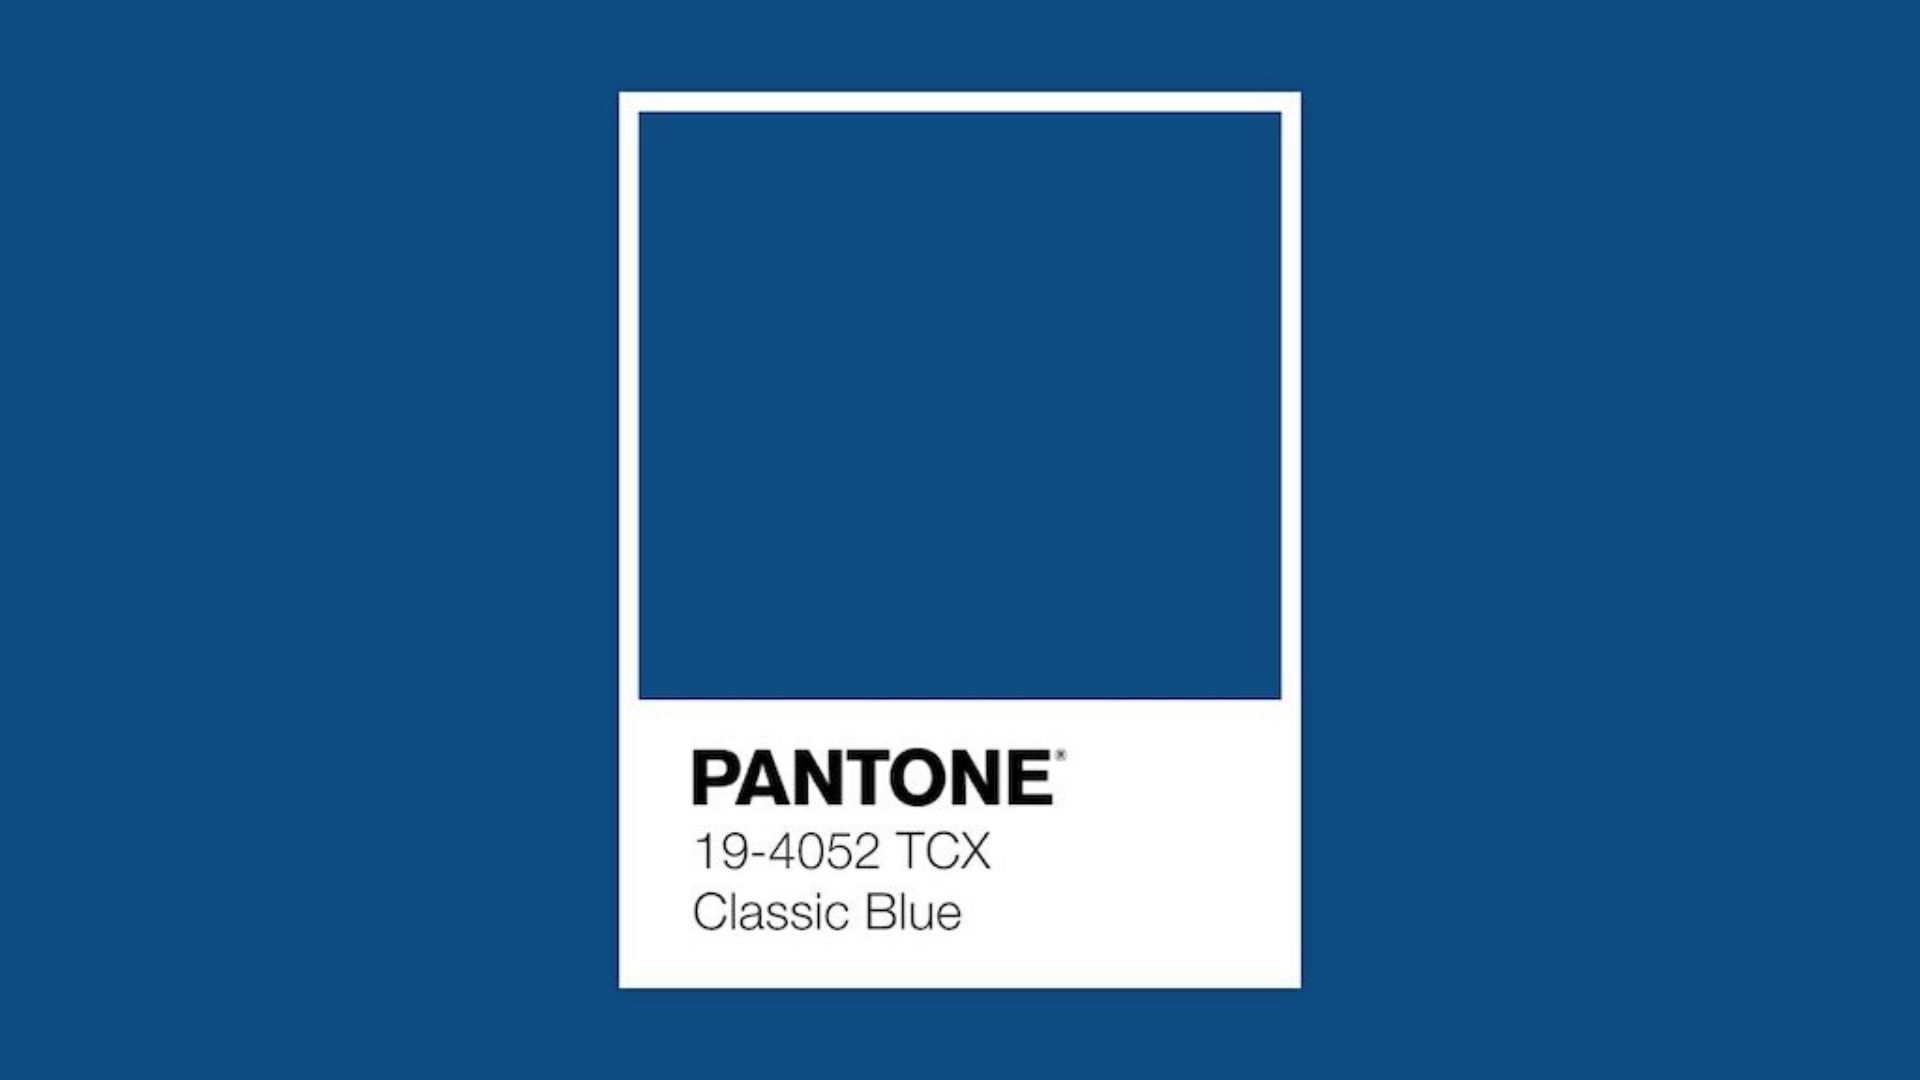 classic blue 2020